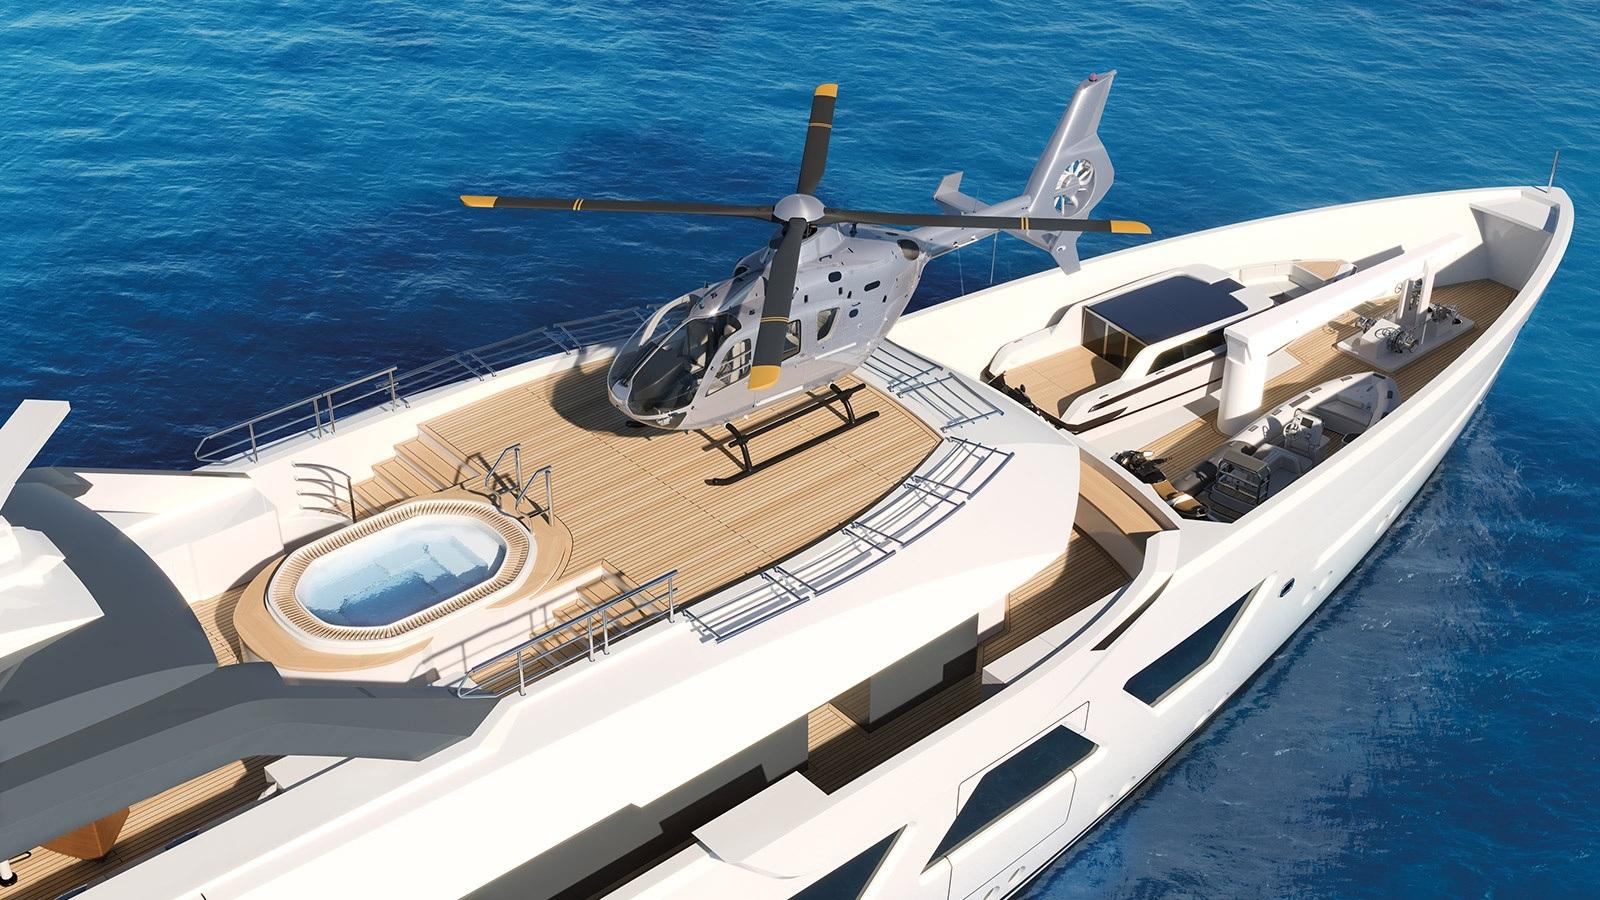 yoHf3BGVTFWdu9s4wyWQ_Amels-60-superyacht-concept-2-2560x1440.jpg